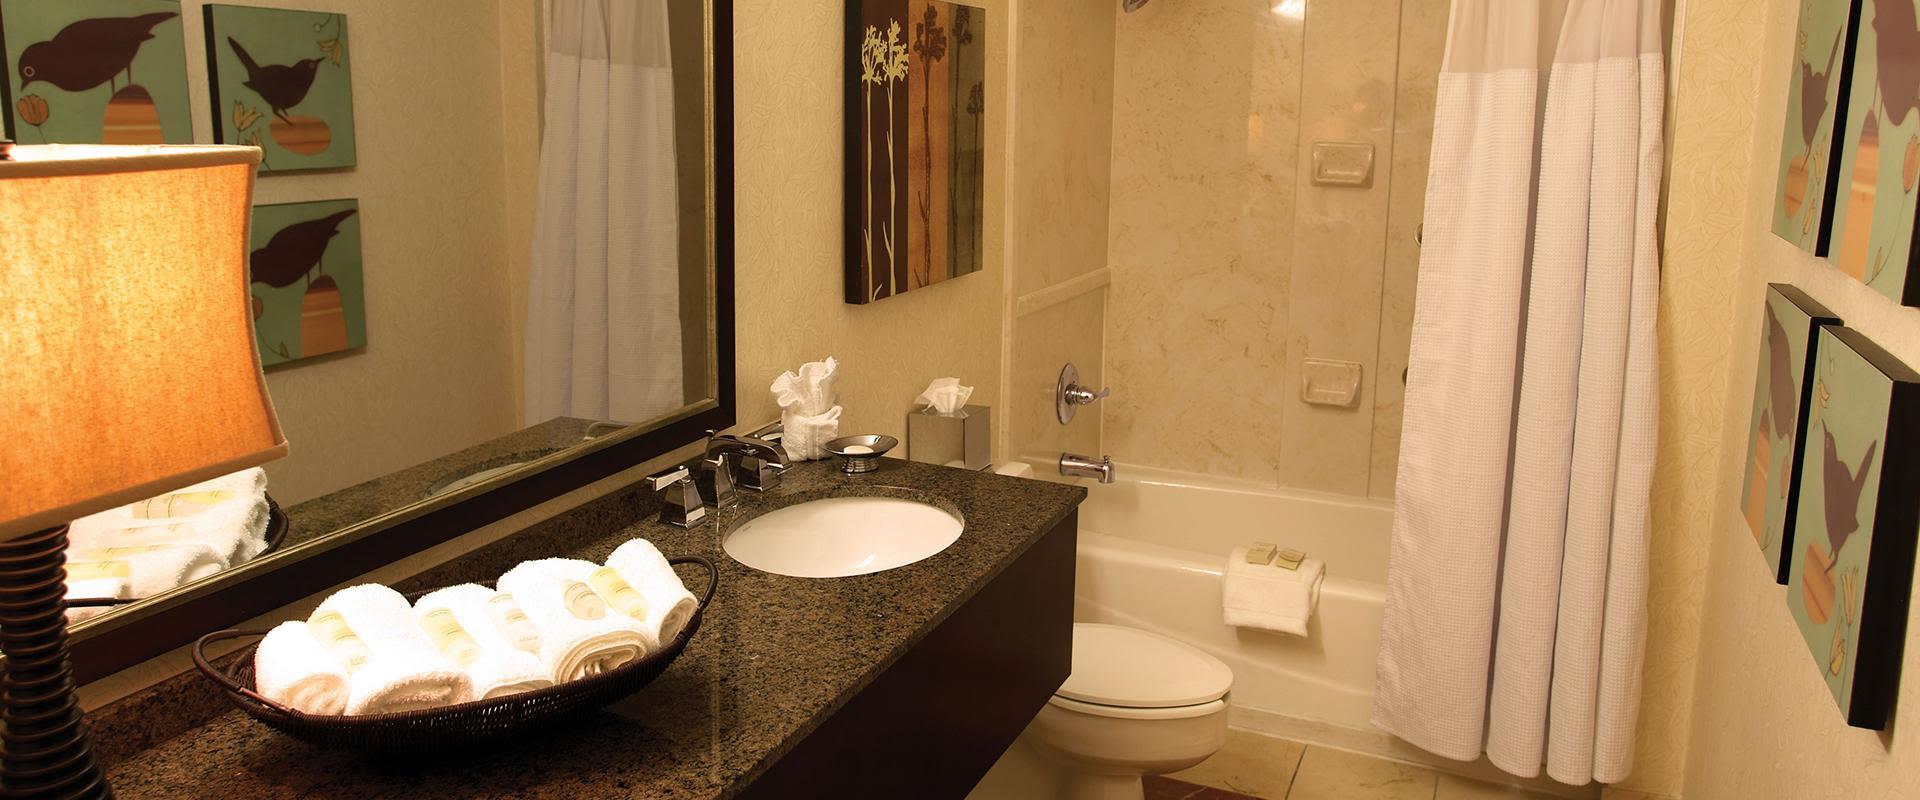 Atlanta Airport Hotel Guest Bathroom Vanity